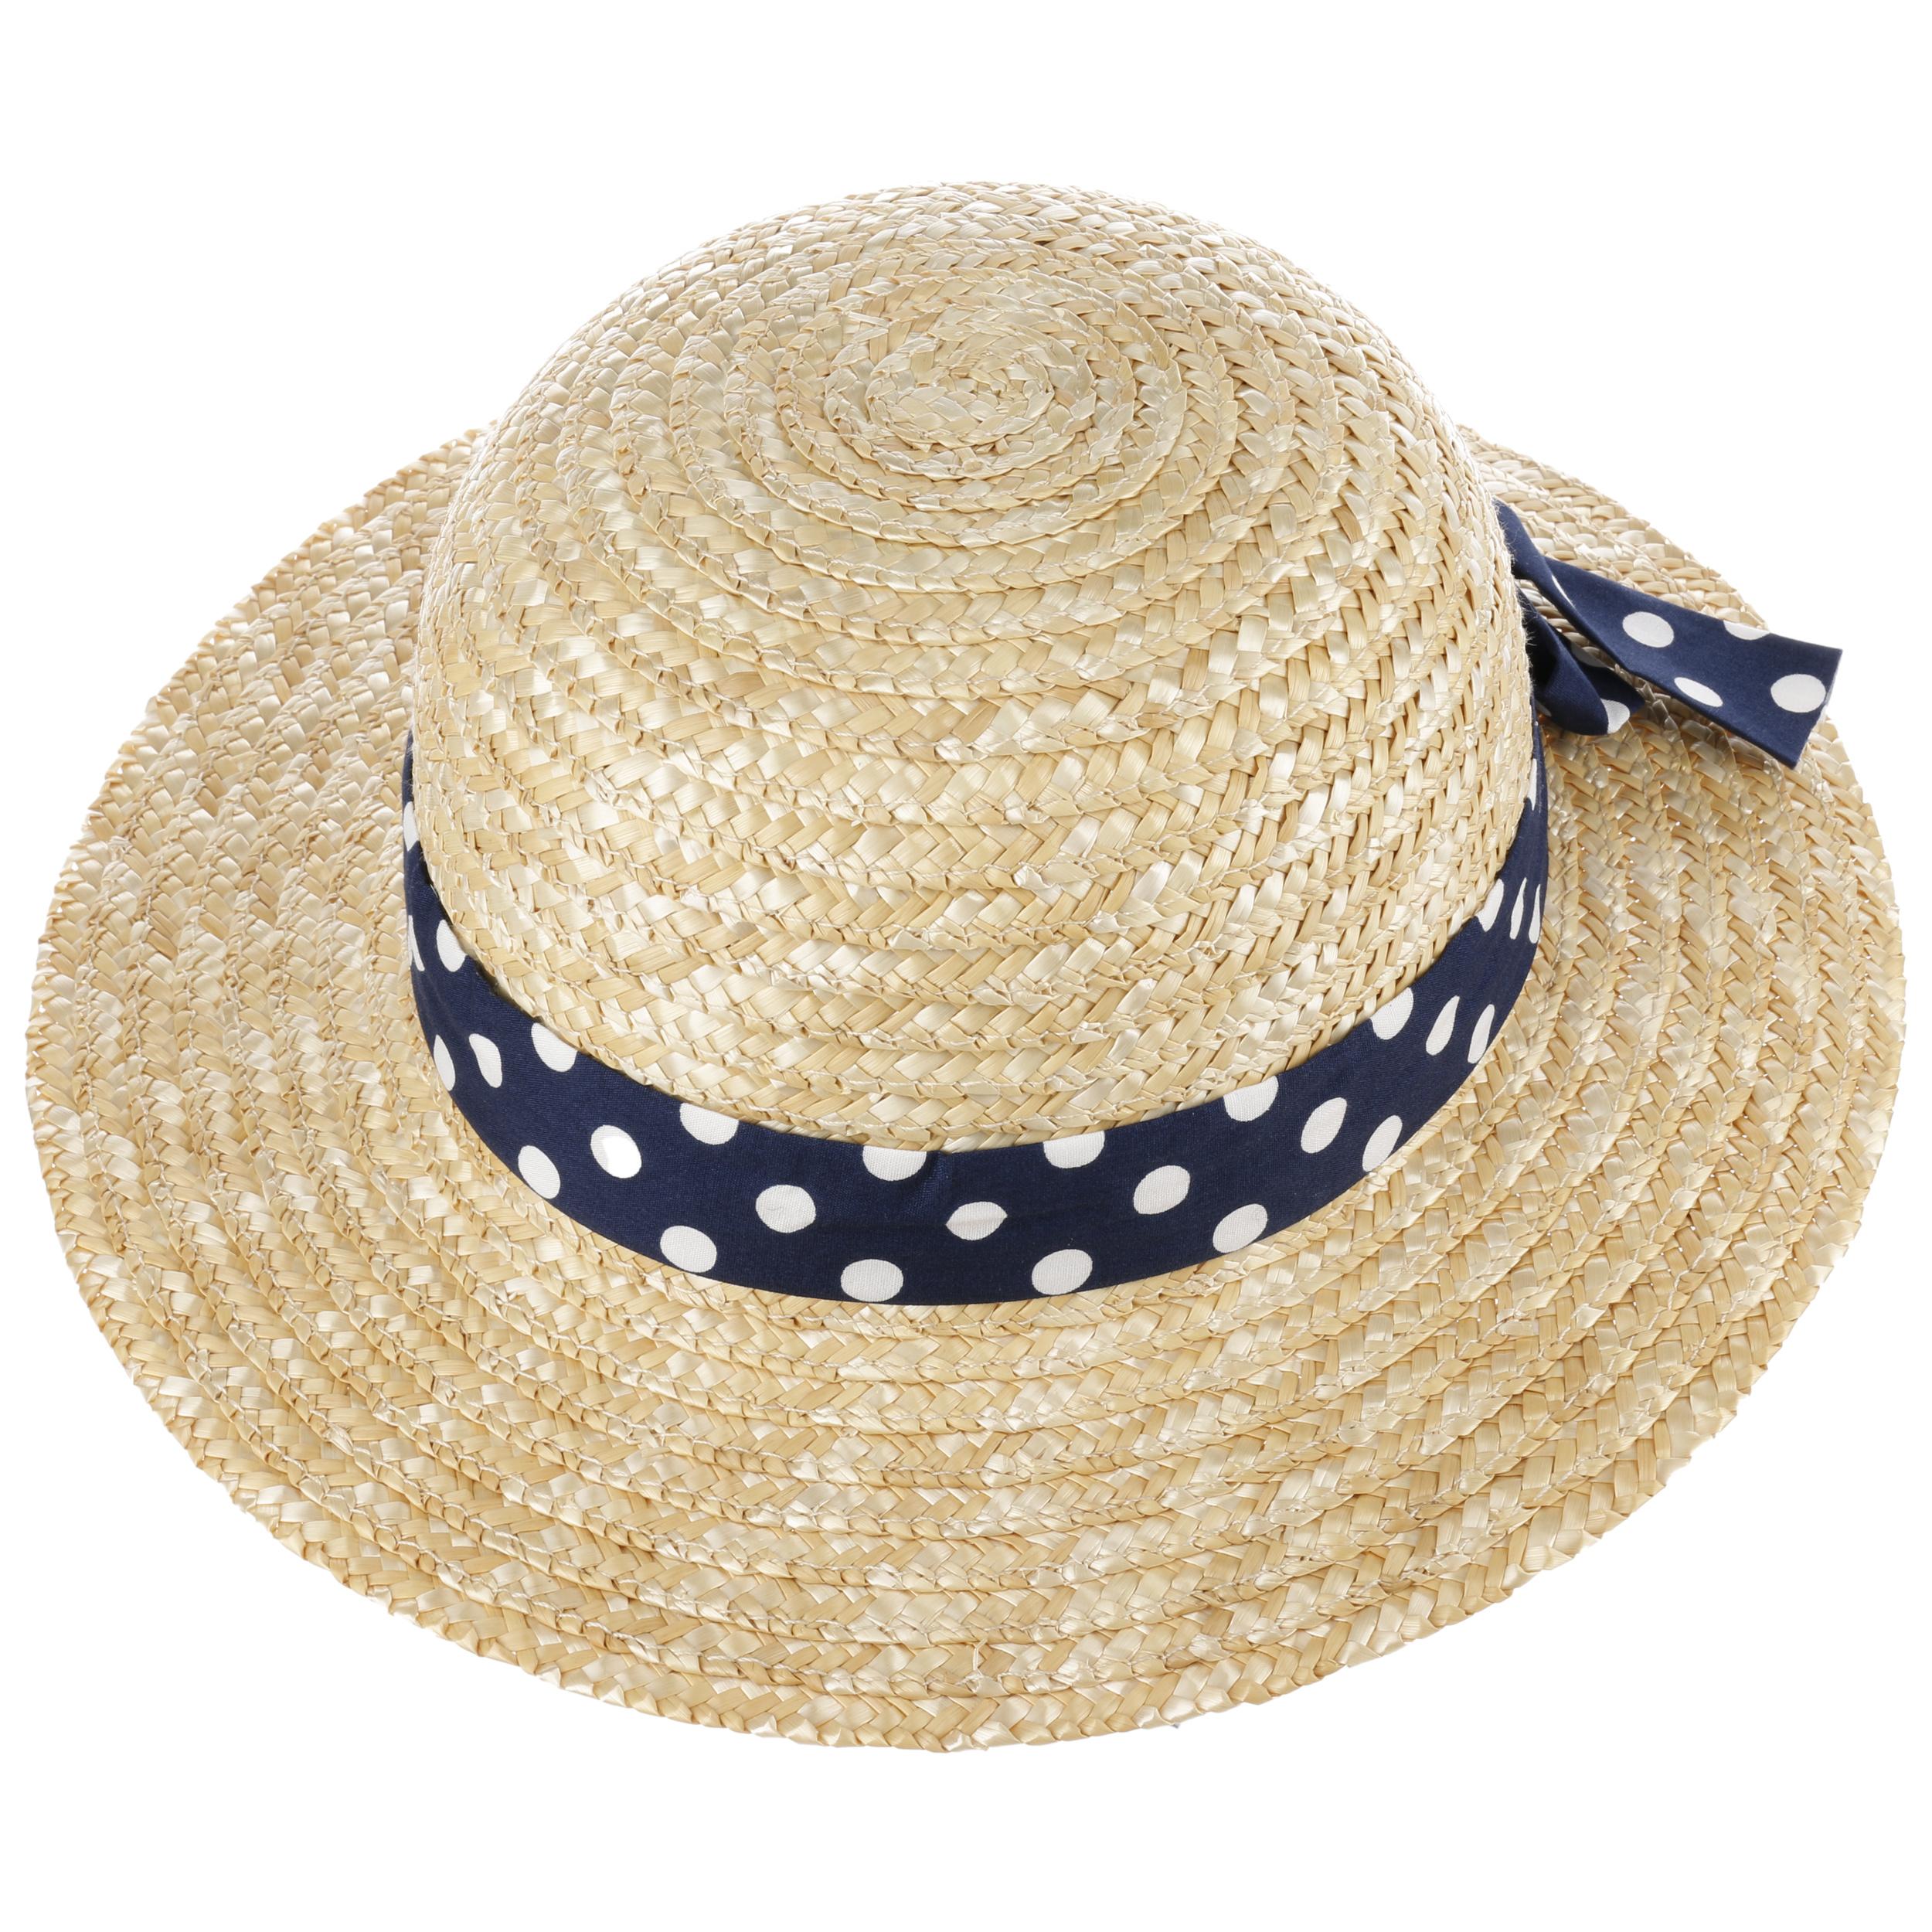 388b4cc4274 Dotted band girls straw hat maximo hats caps jpg 2500x2500 Girls straw  fedora